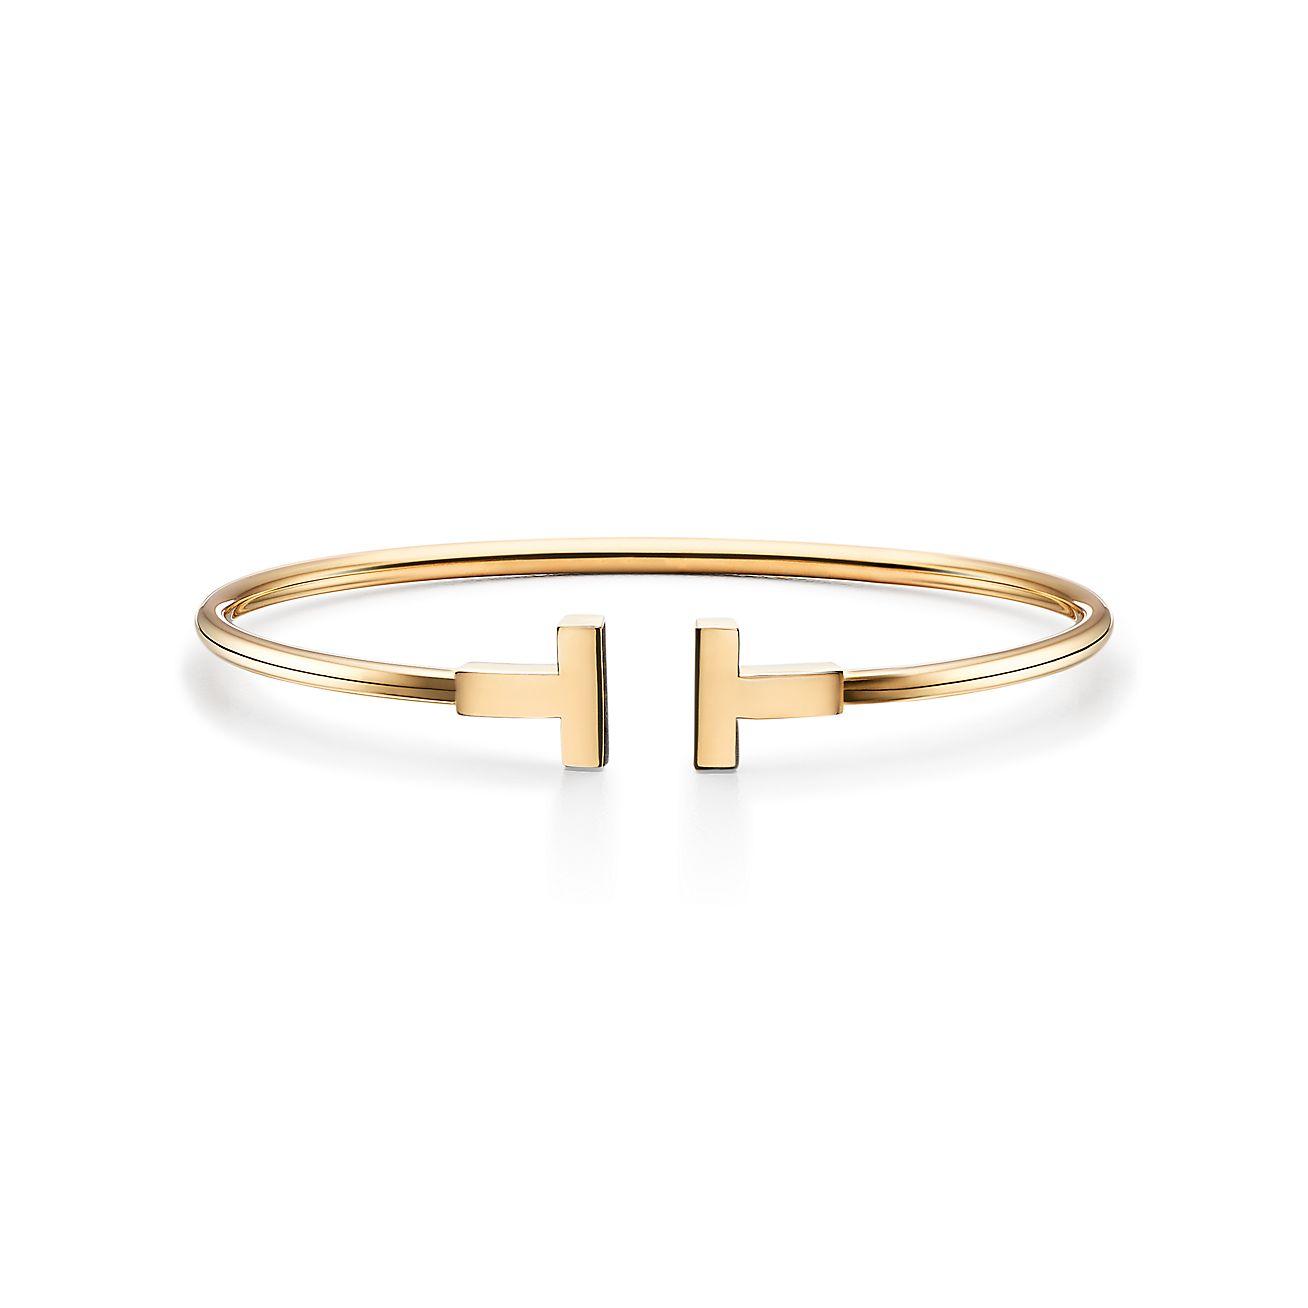 Cuff Bracelet TY13 Genuine Leather Fashion Bracelet Silver Tone Brass 8 Length